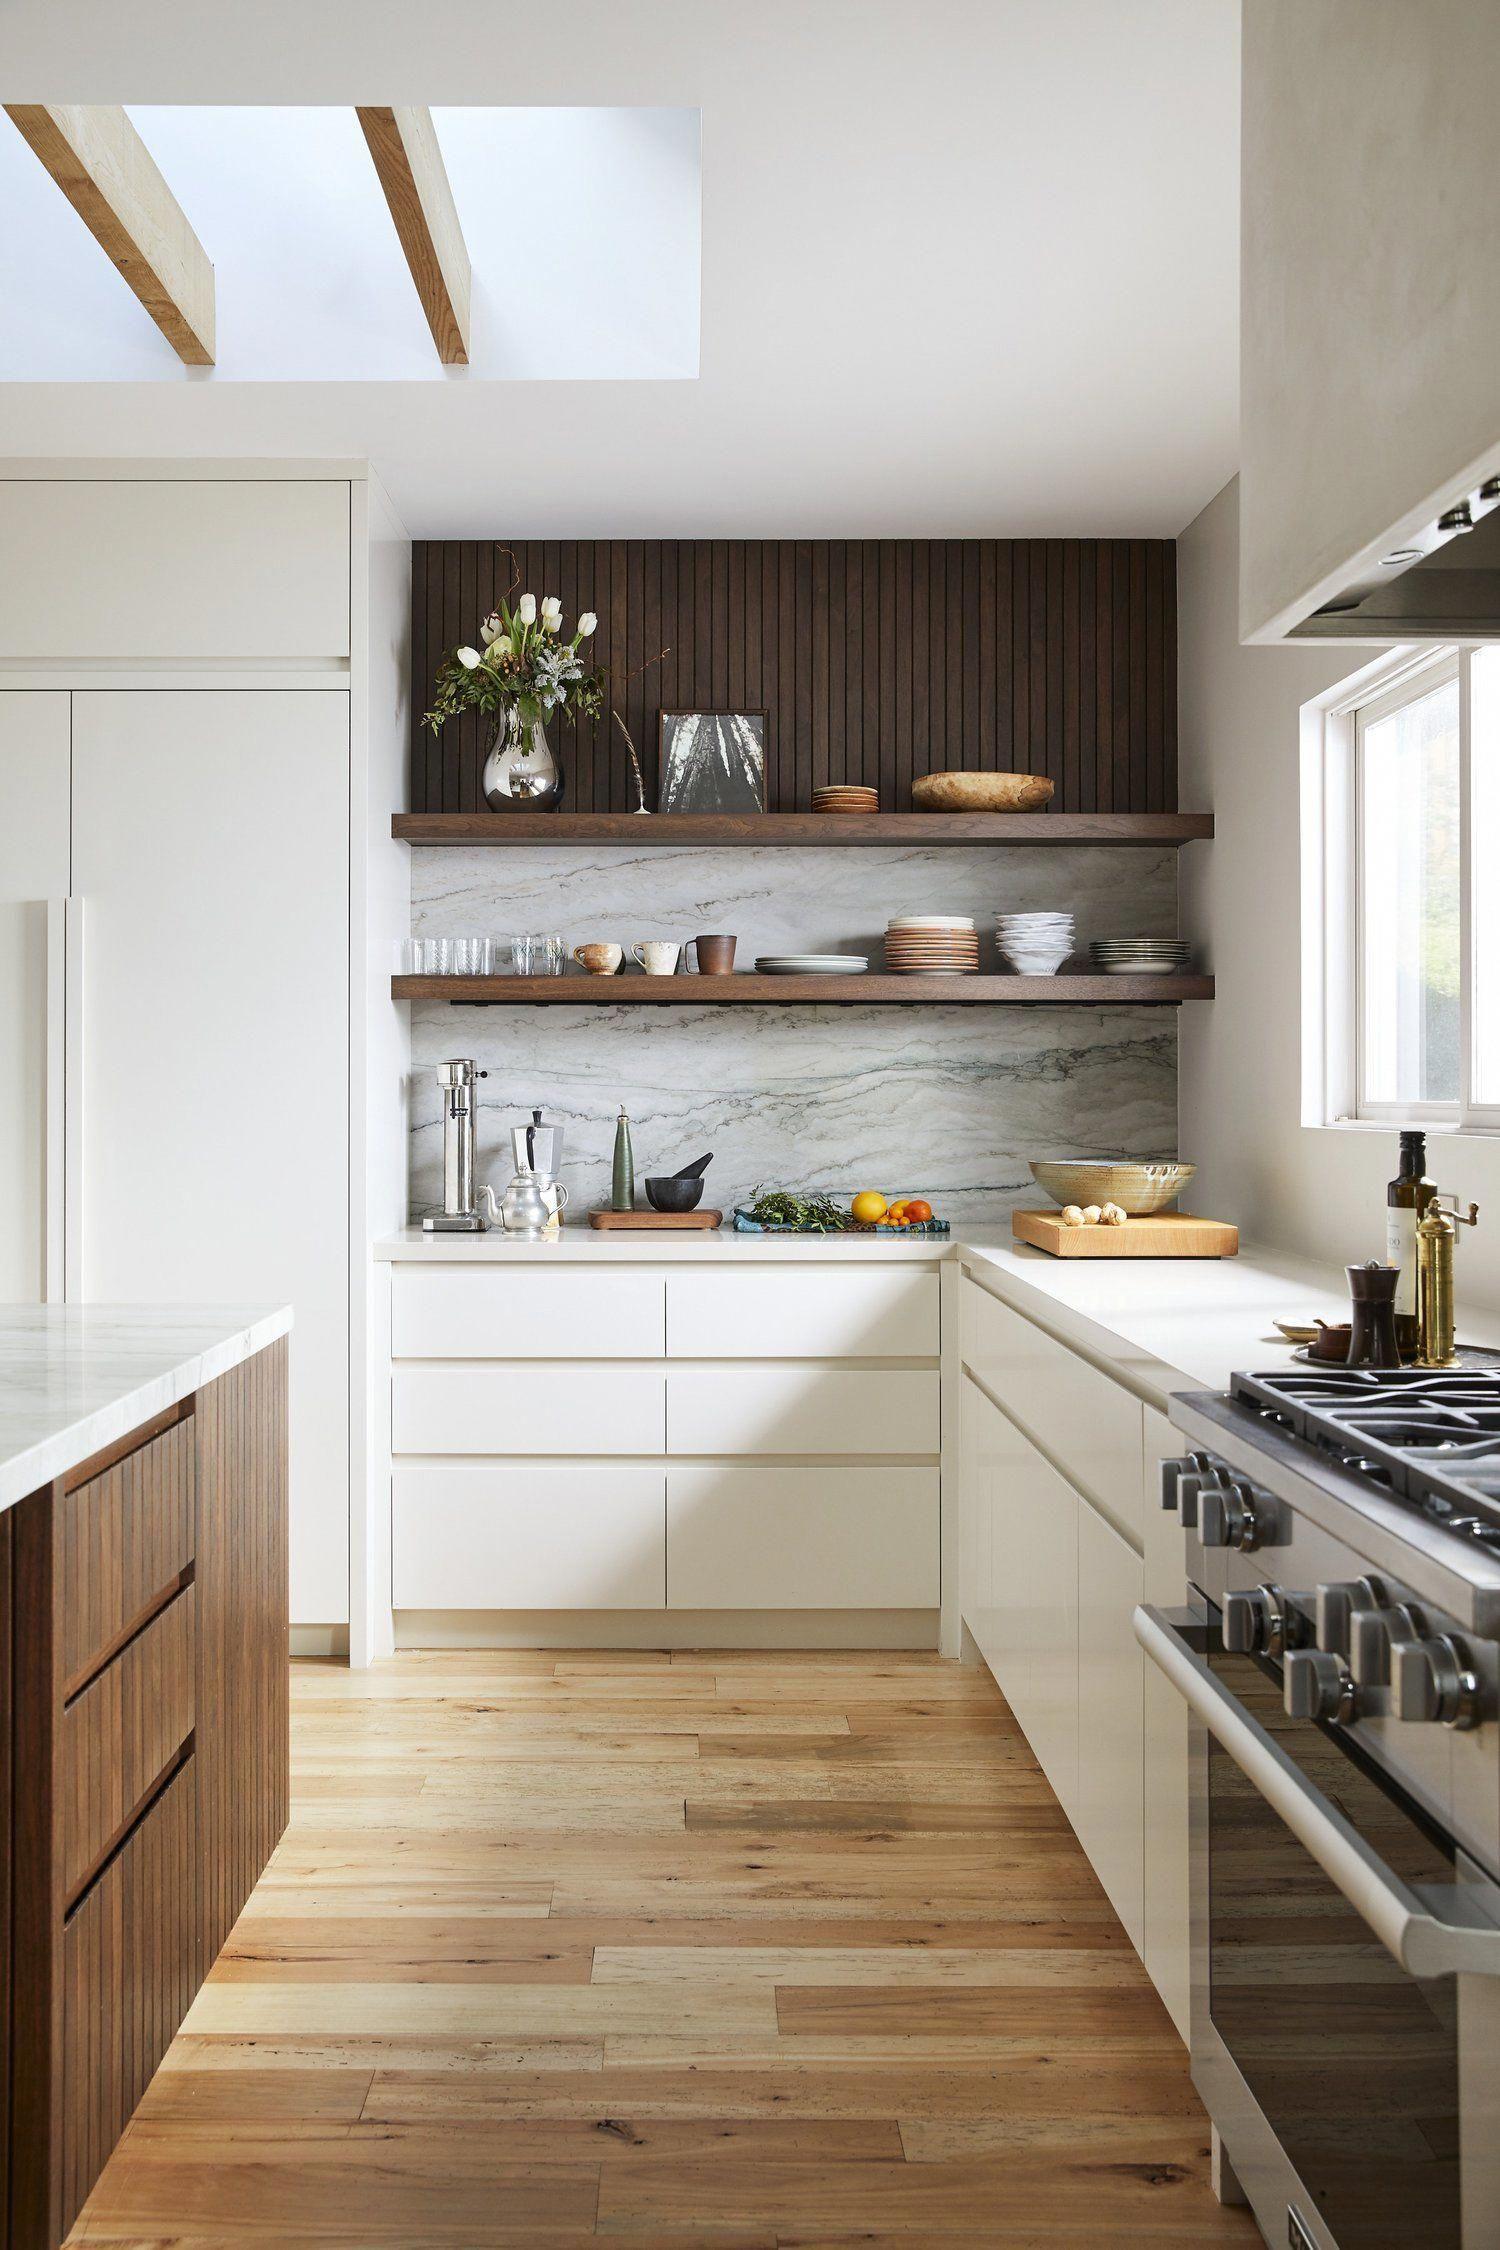 White Kitchen Cabinets Marble Kitchen Modern Kitchen Organic Kitchen Plaster Vent Hood Mod Kitchen Design Small Modern Kitchen Design Contemporary Kitchen